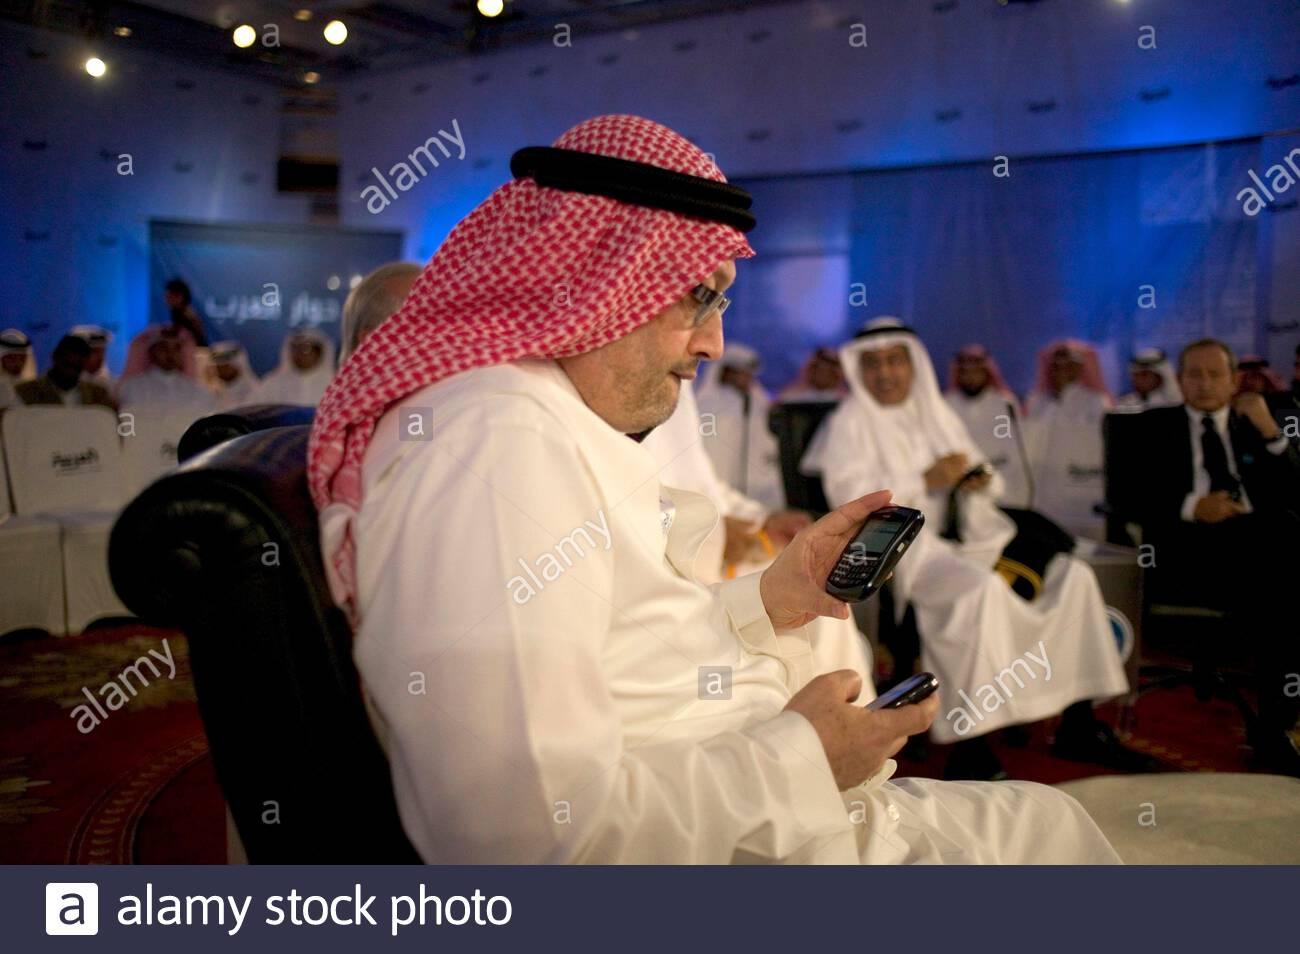 Jamal Khashoggie, Editor in chief of Al Watan Newspaper, Saudi Arabia at the FIKR conference 2007 in Manama, Bahrain. Stock Photo